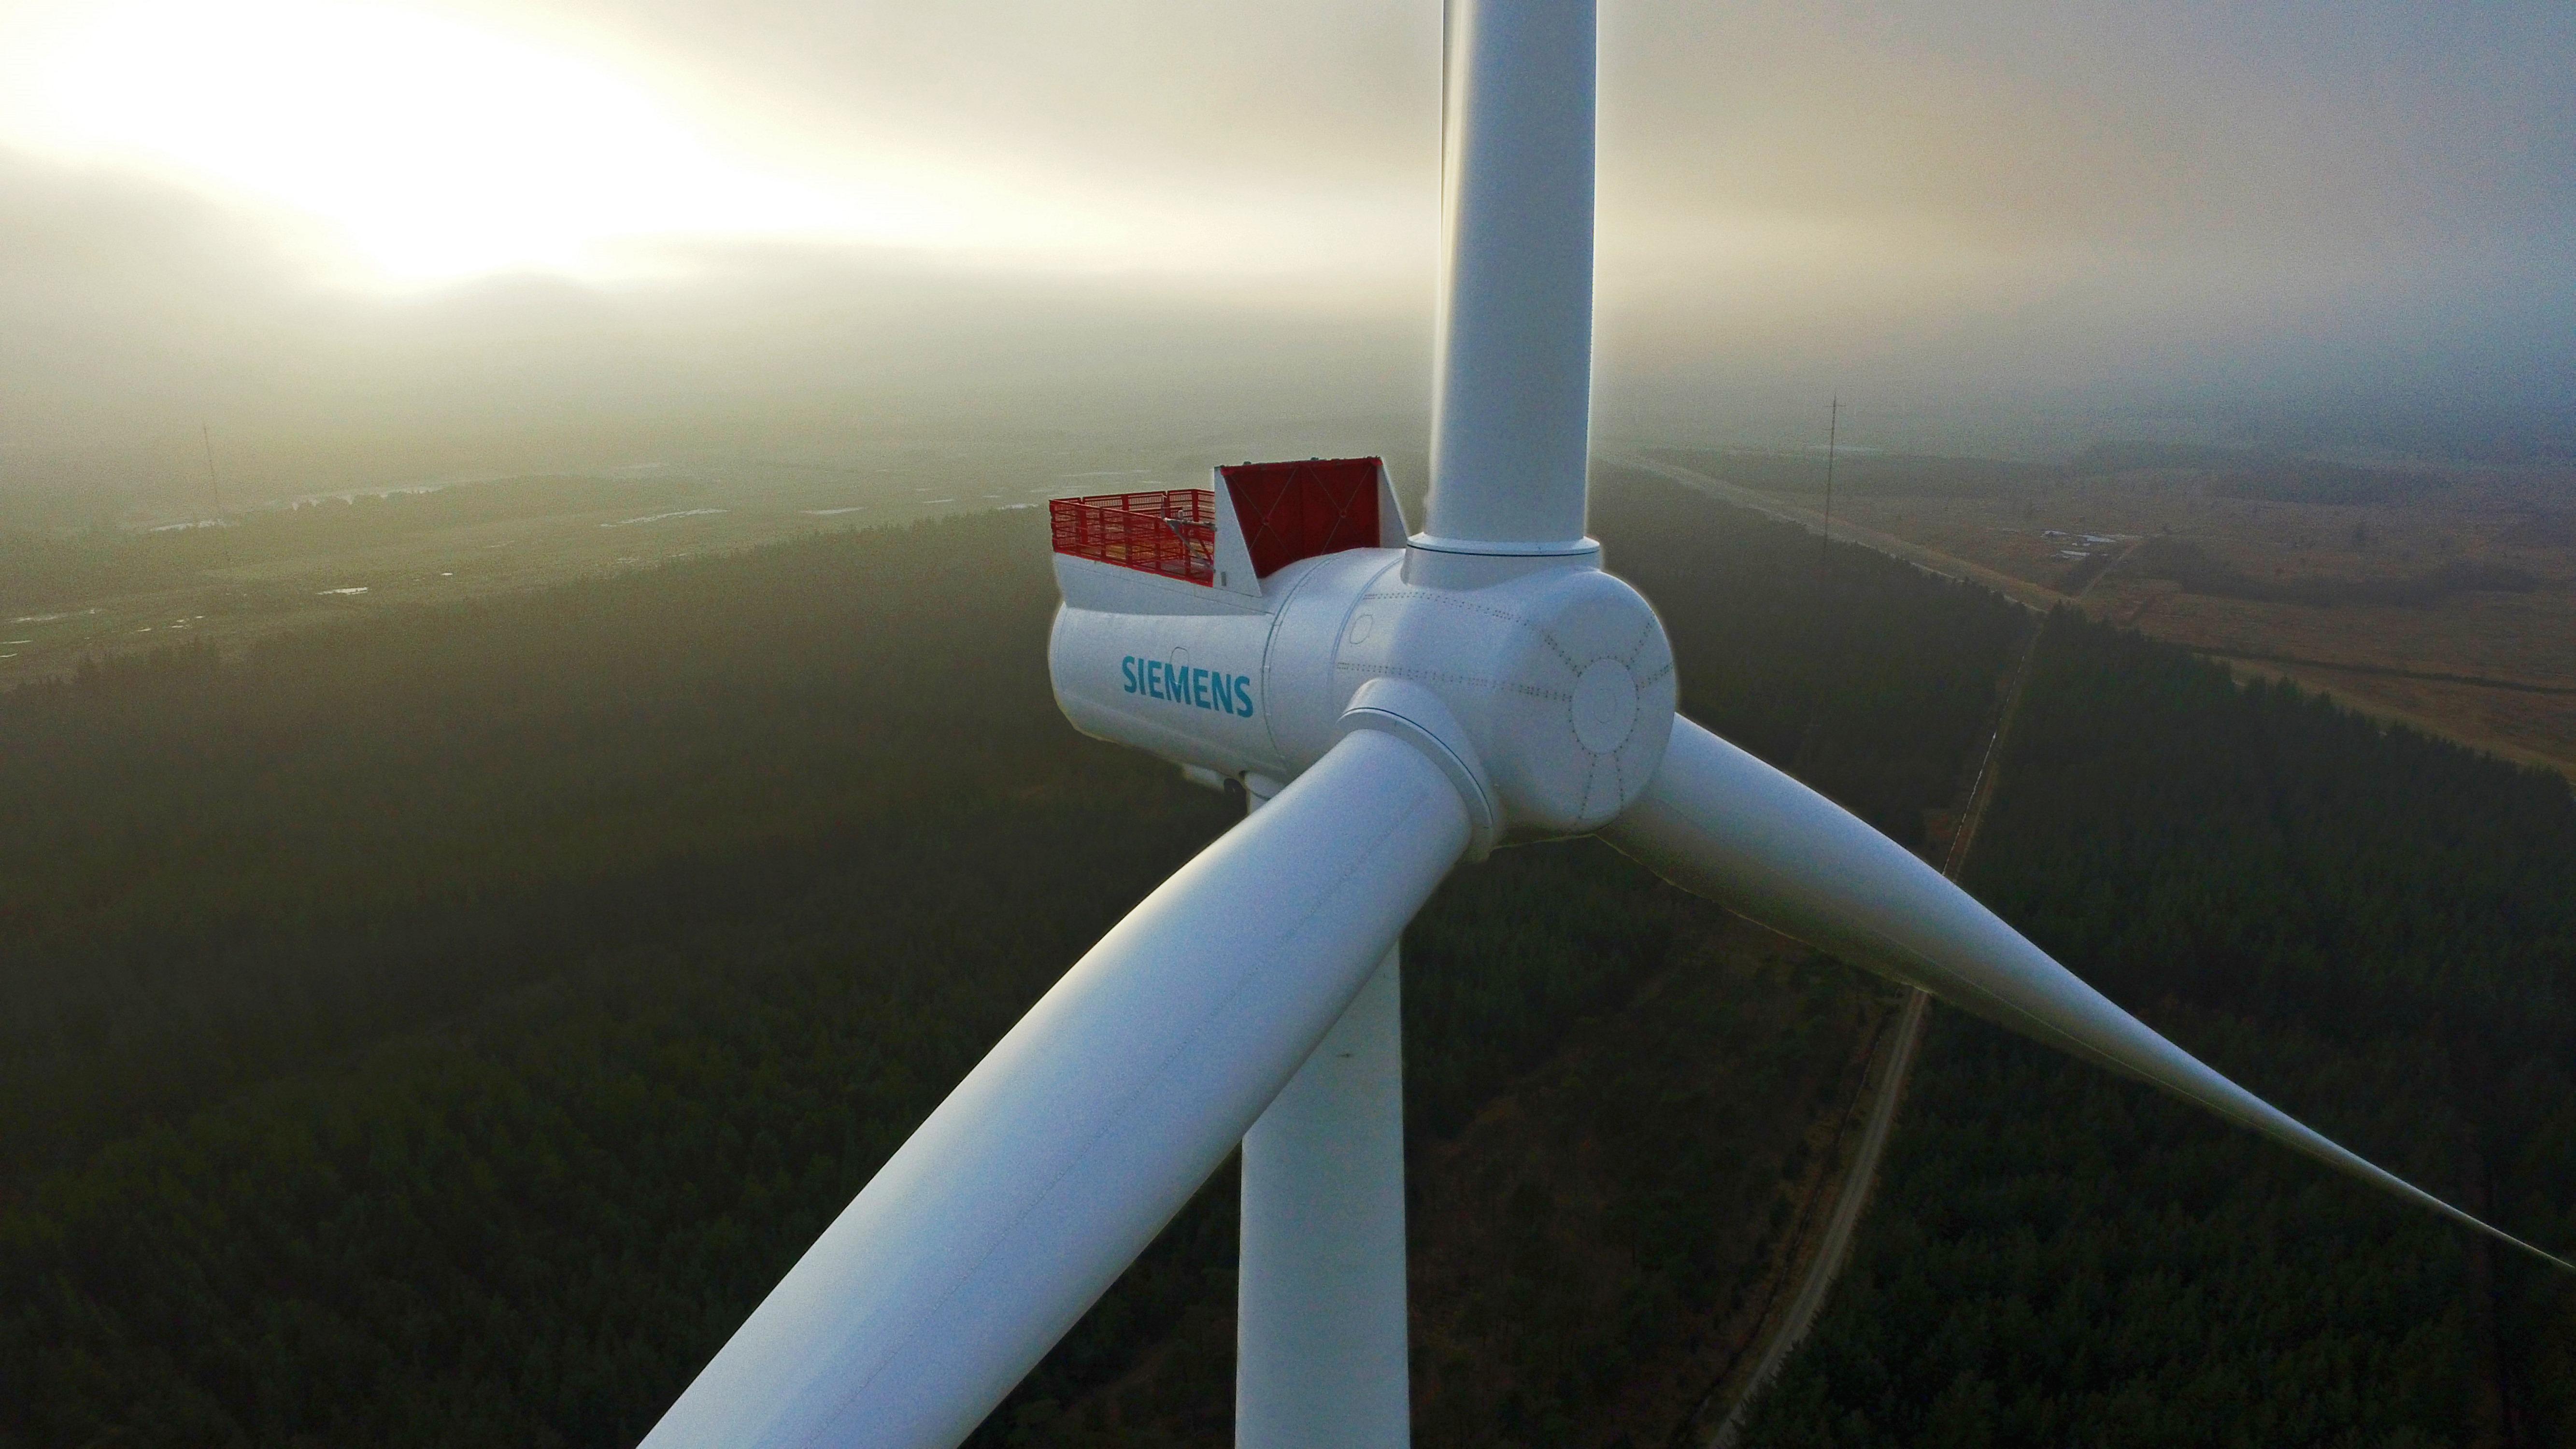 Siemens vindmølle